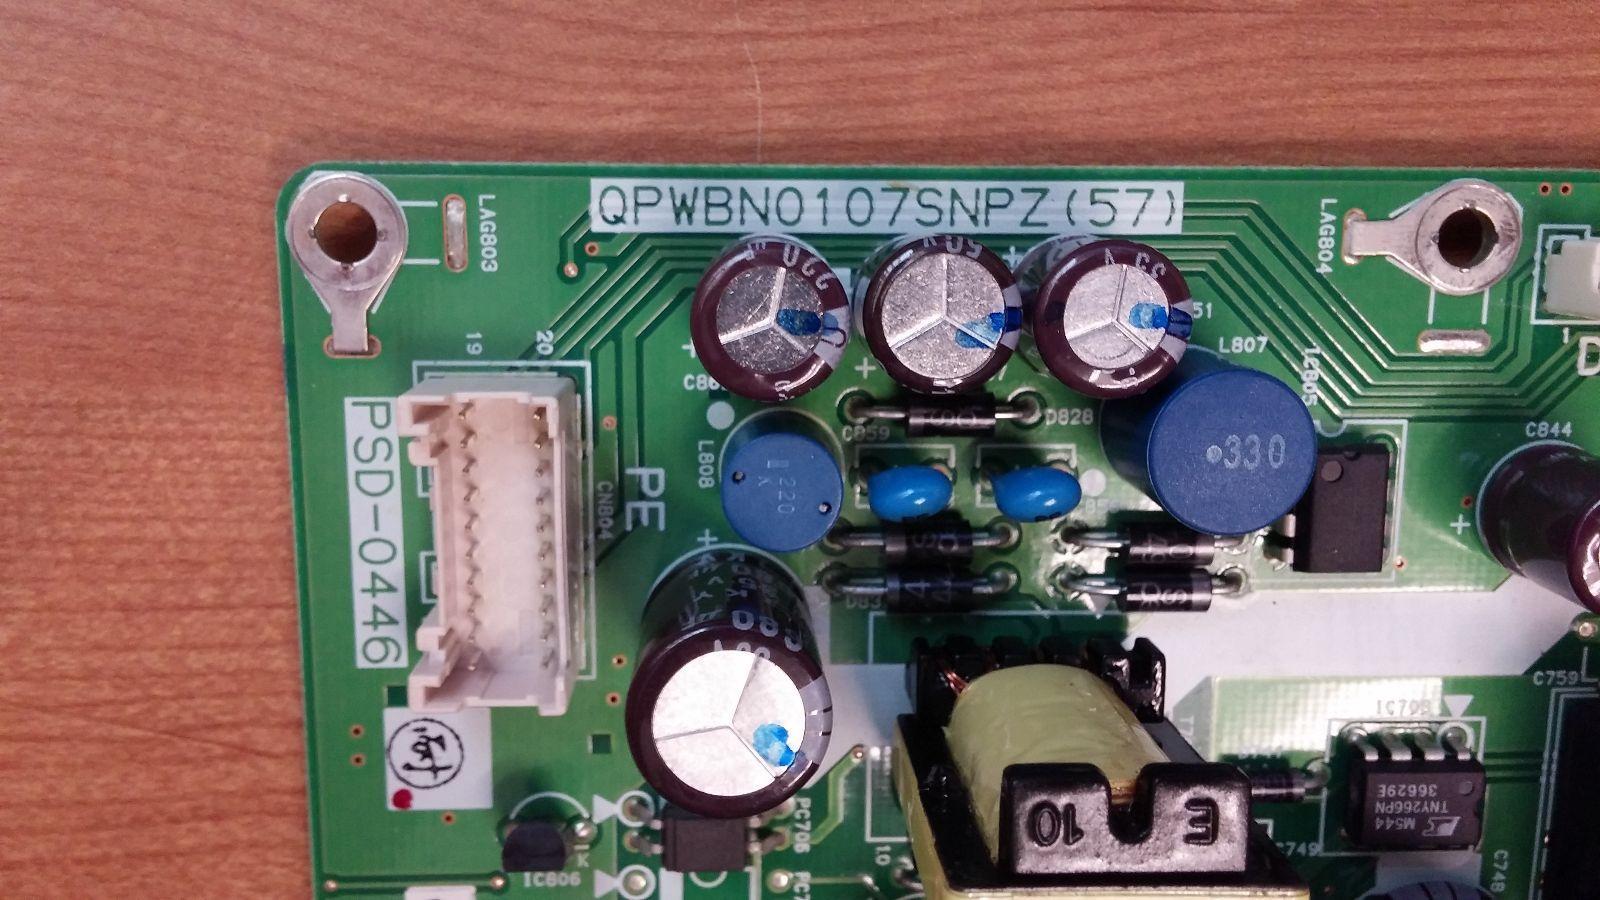 Sharp RDENCA138WJQZ (QPWBN0107SNPZ(57)) Power Supply Unit **FREE SHIPPING**